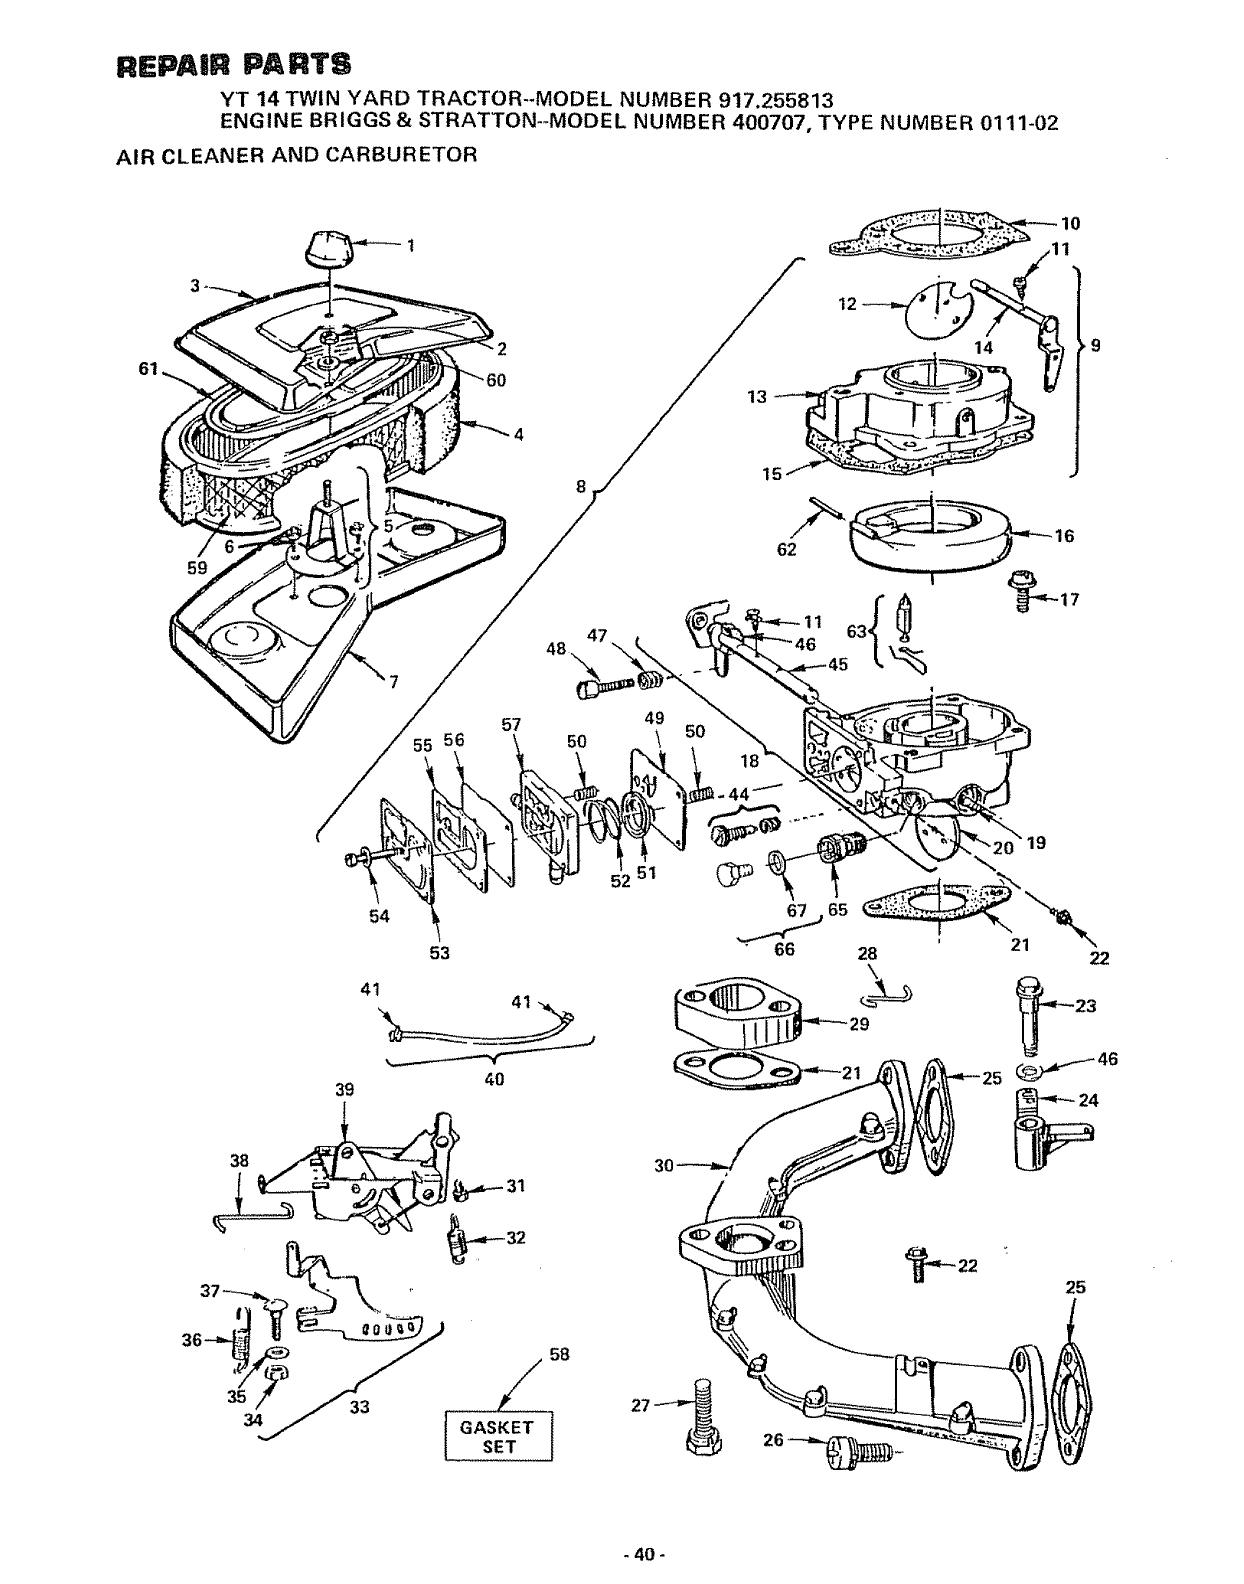 Craftsman User Manual Yt 14 Twin Yard Tractor